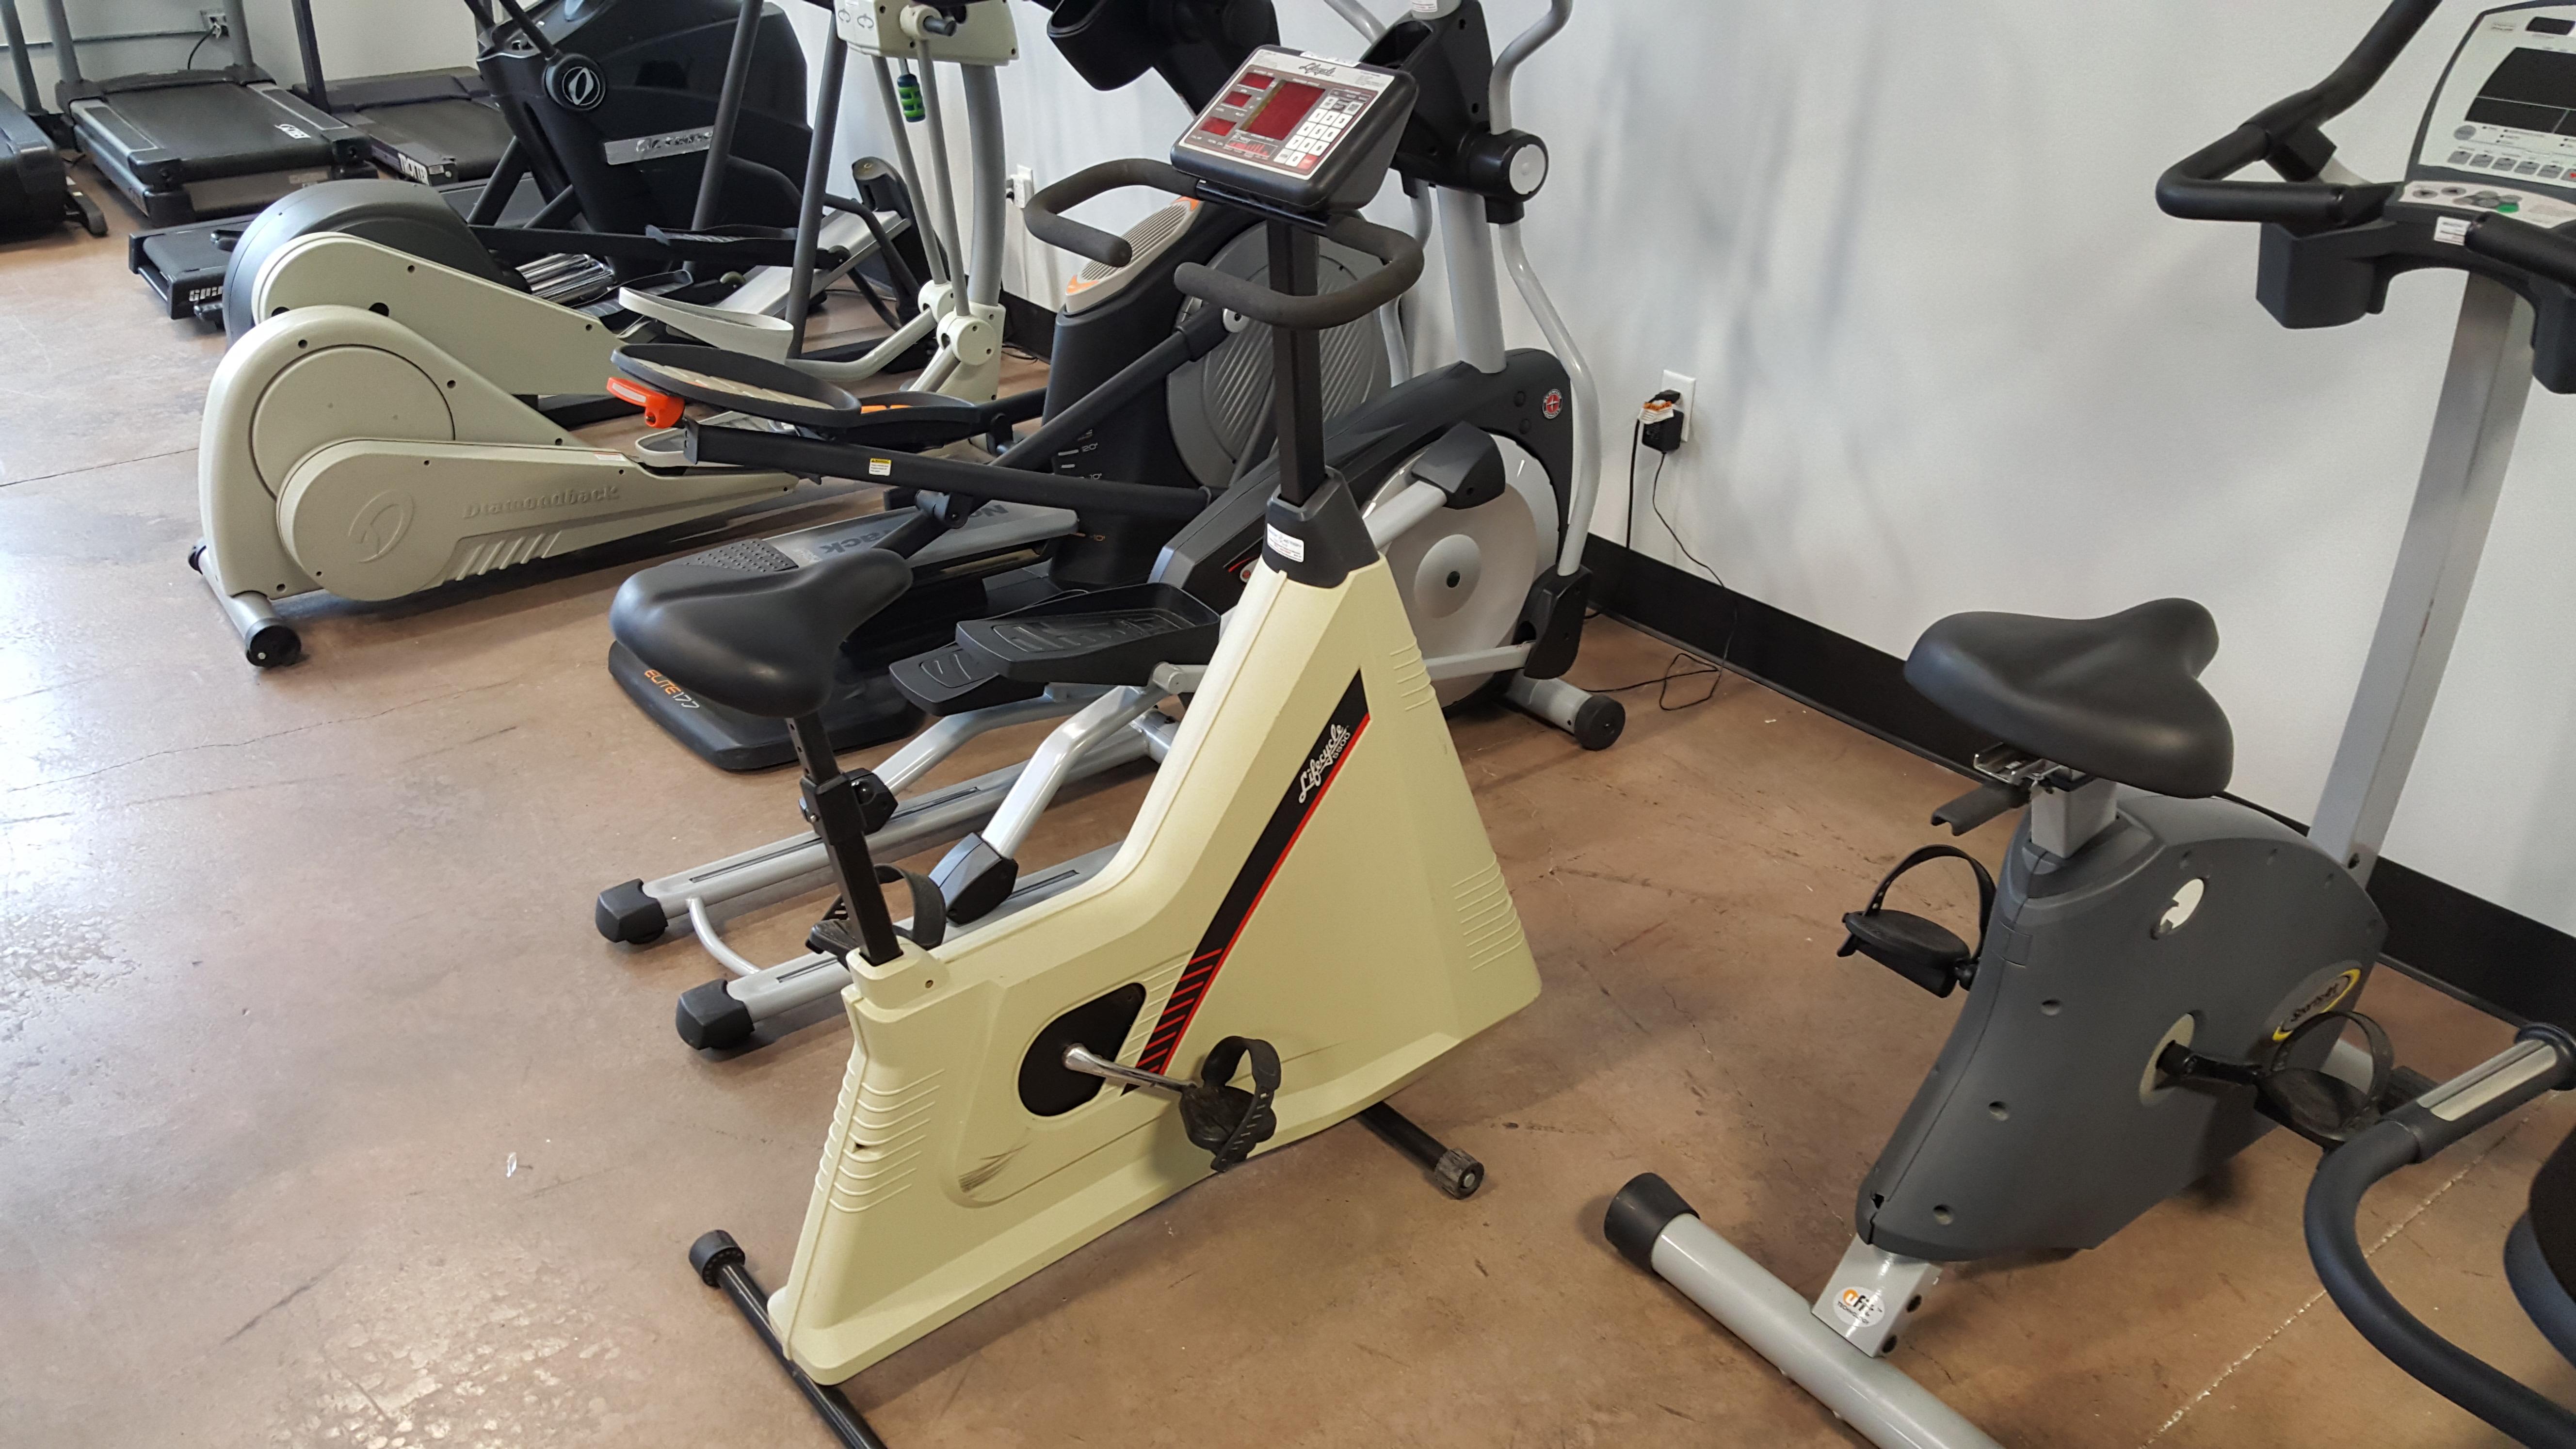 Life Fitness Lifecycle 5500 Upright Bike 250 00